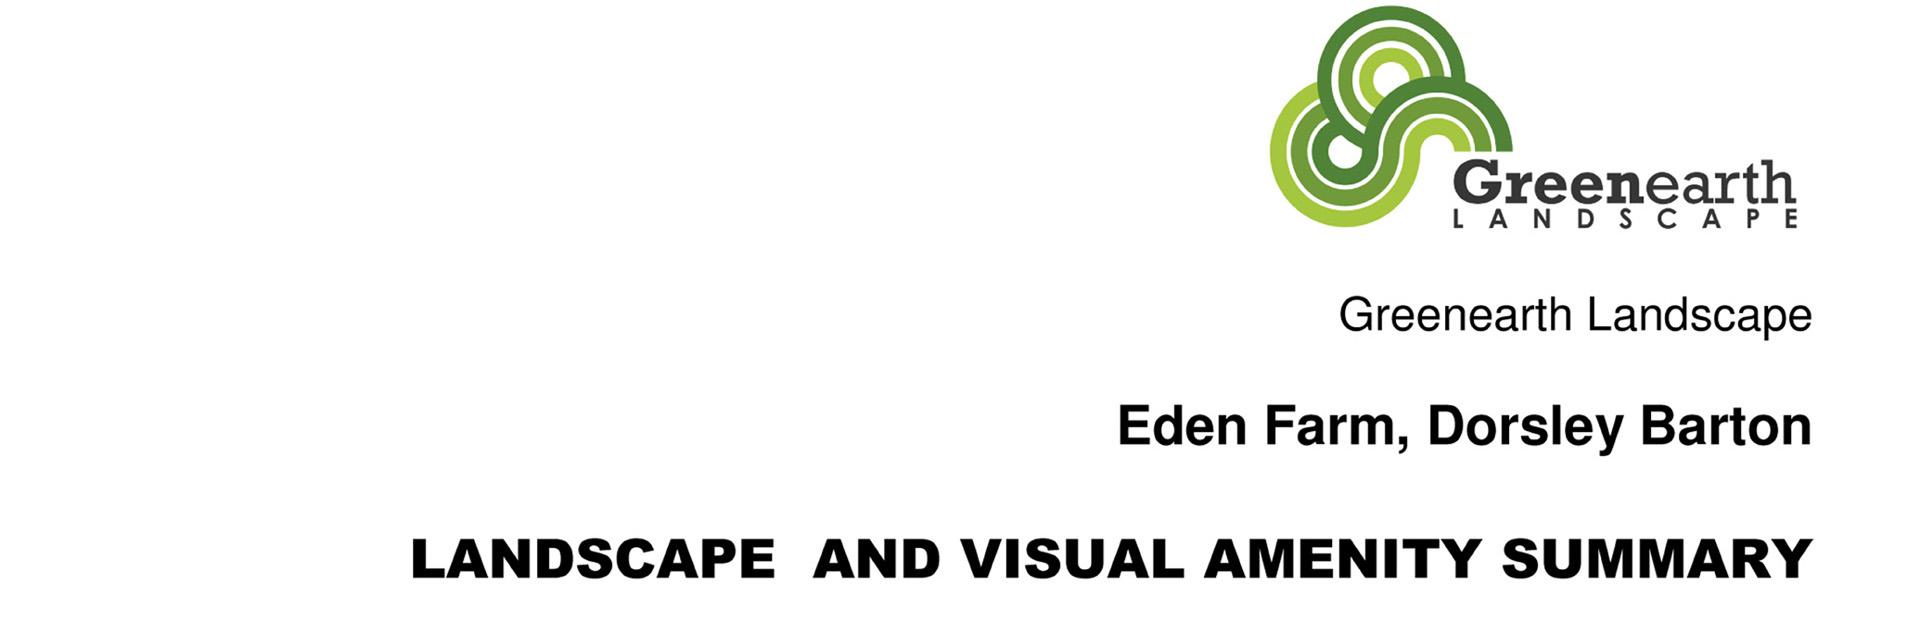 Eden-Farm-LVA-Summary-1